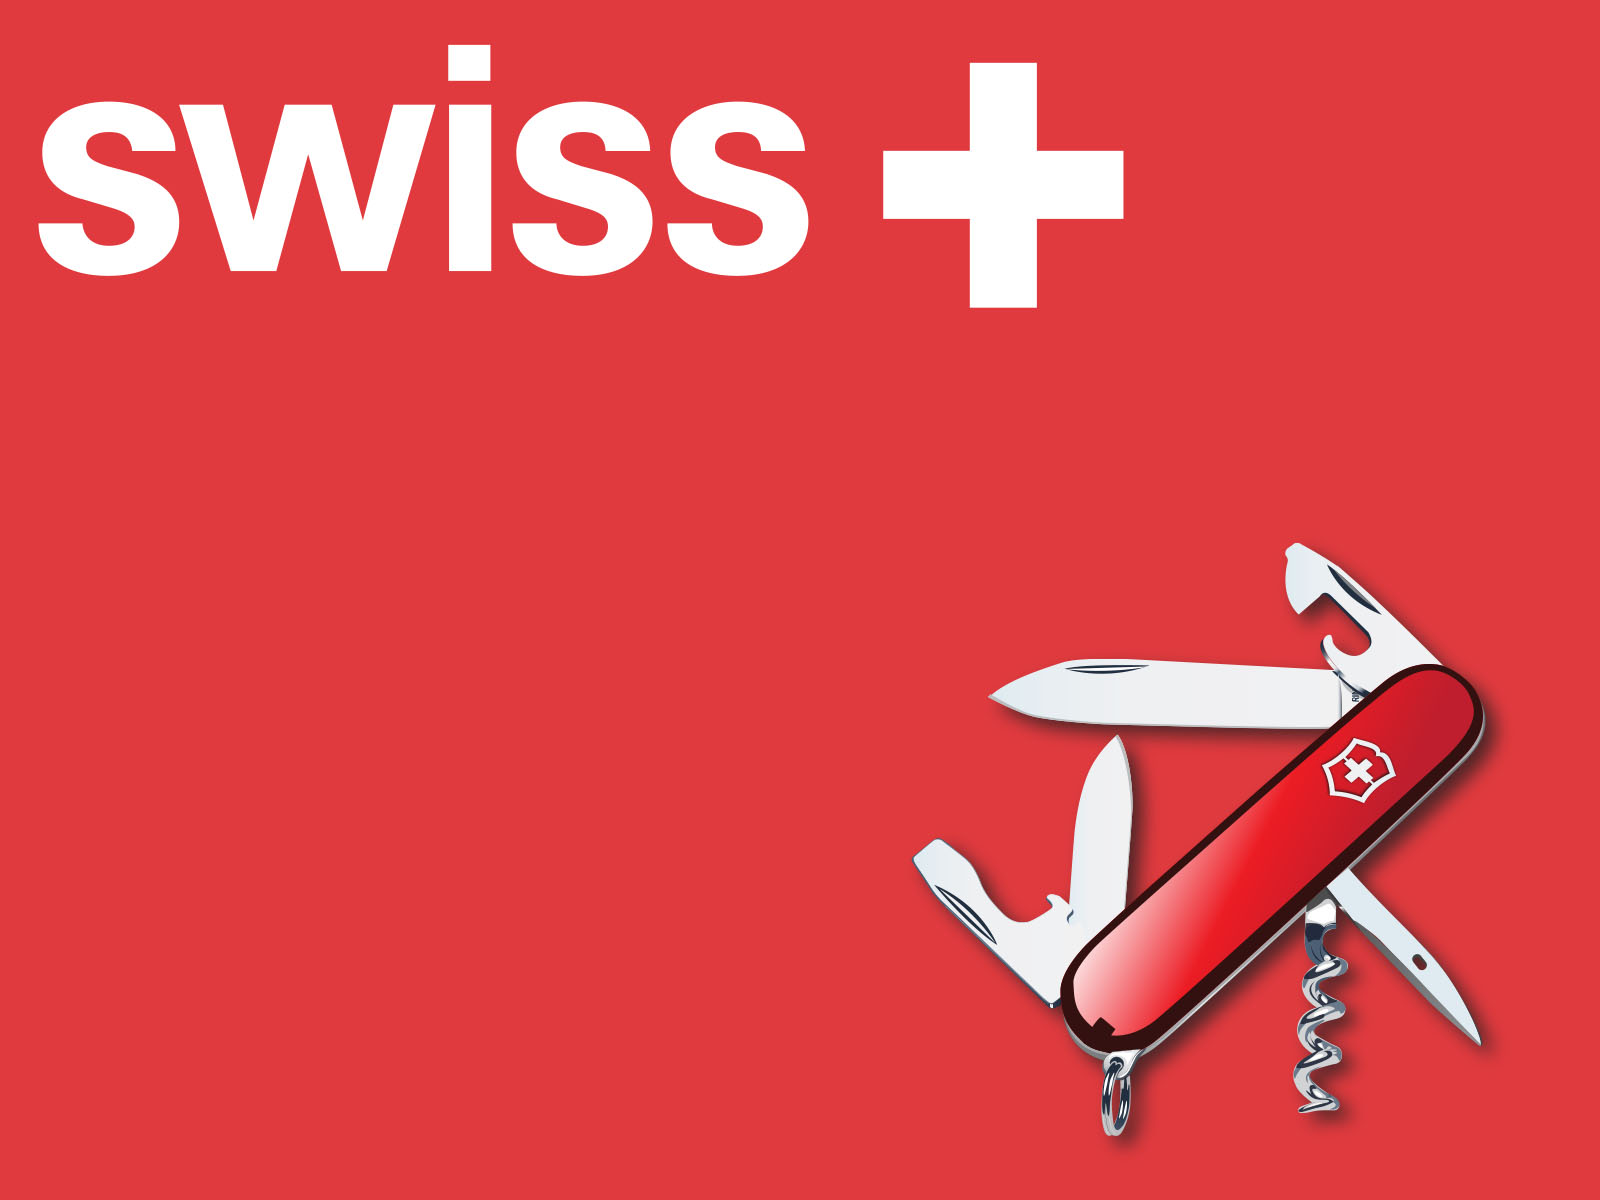 Swiss Victorinox PPT Background